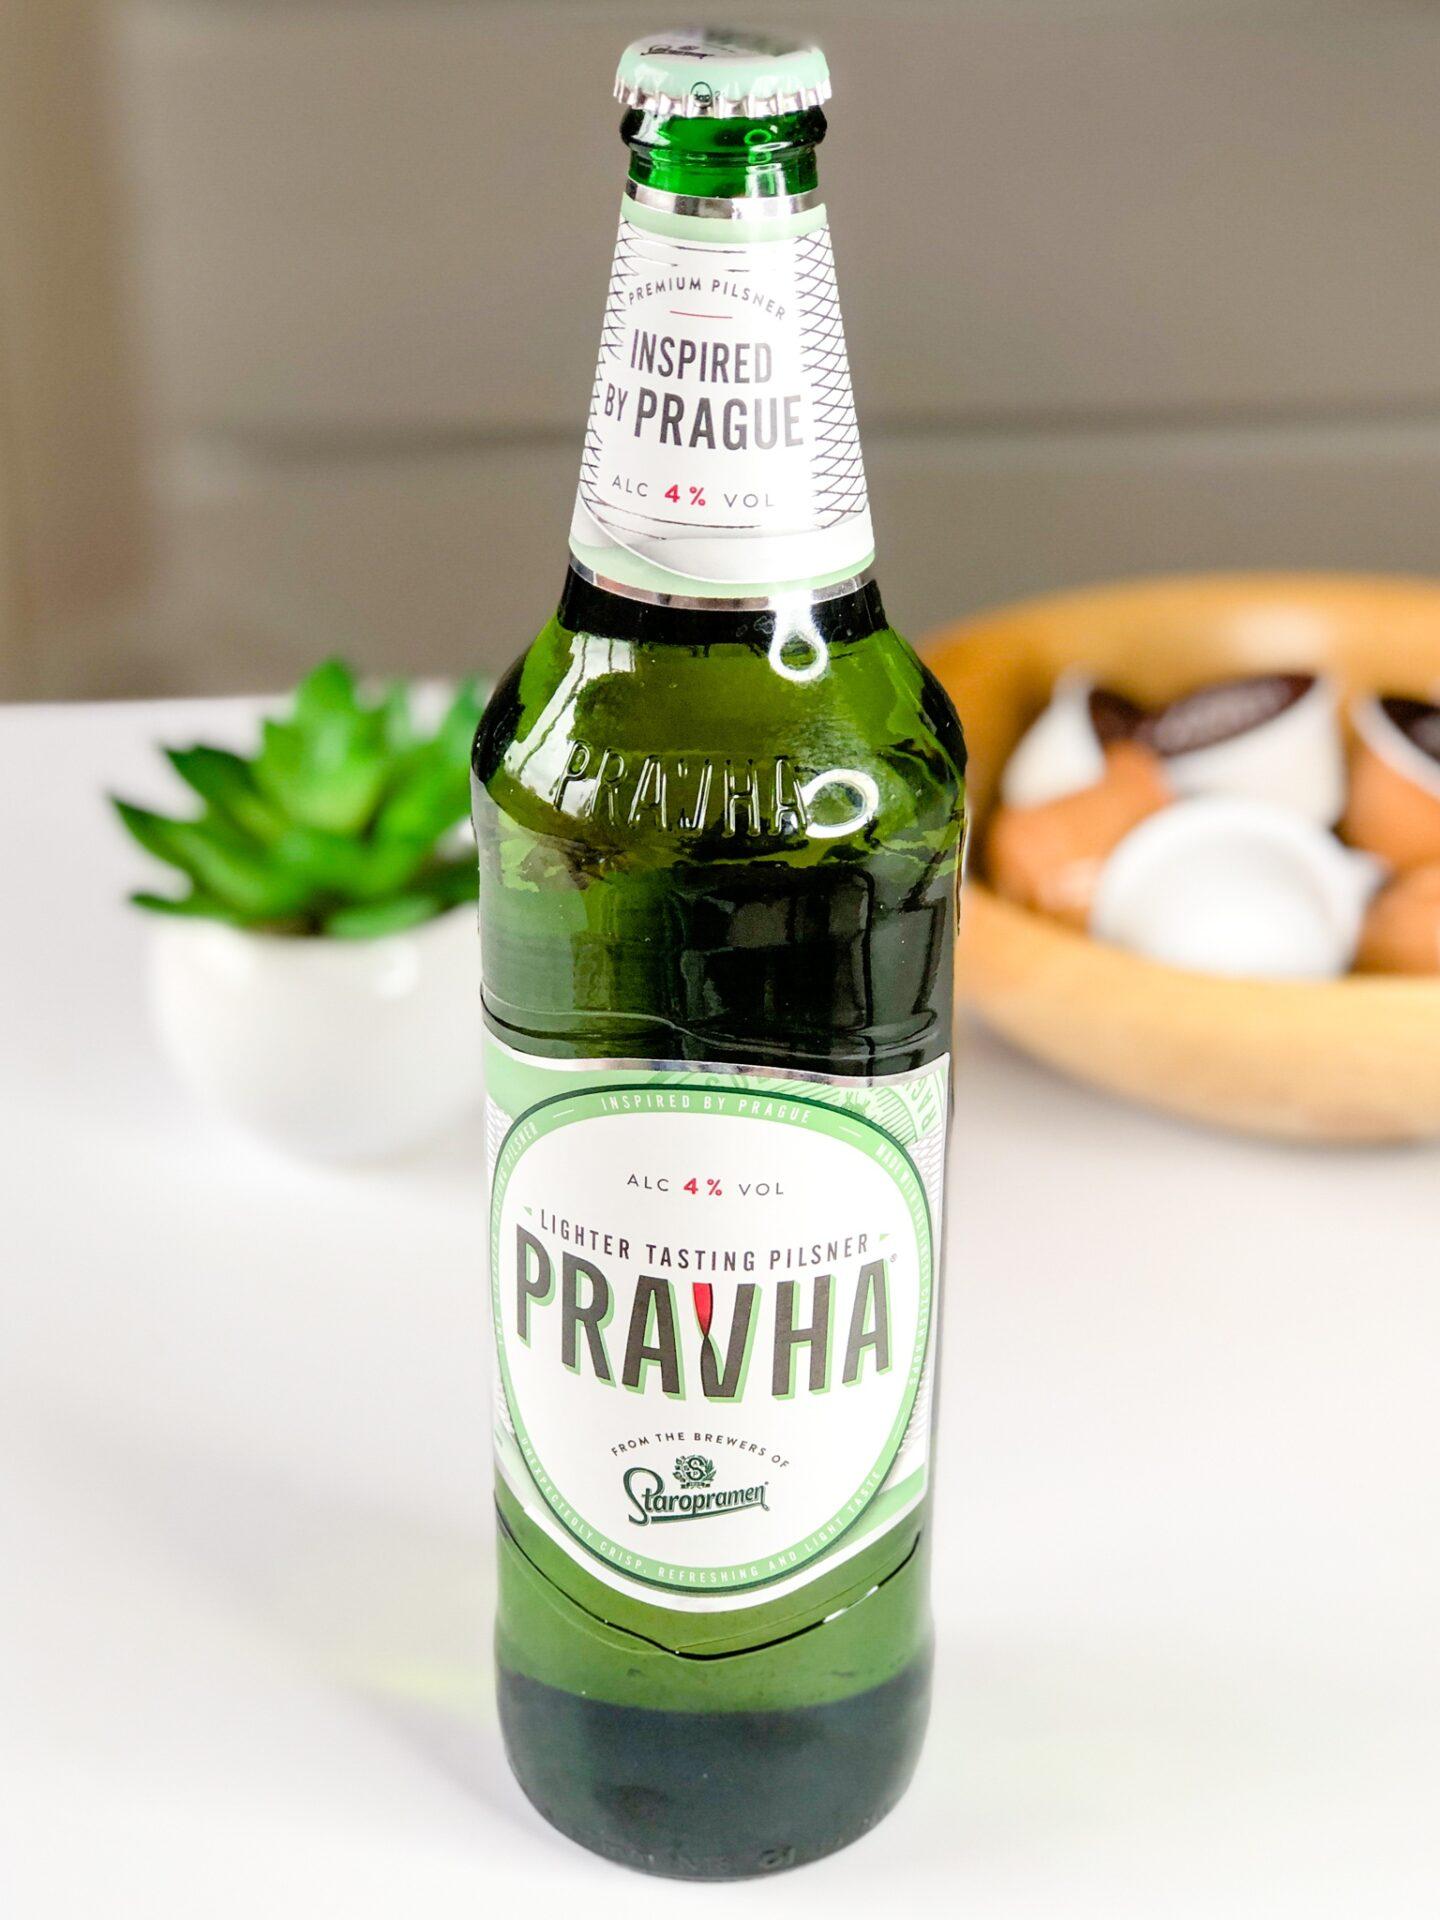 Lighter Tasting Pilsner - Pravha